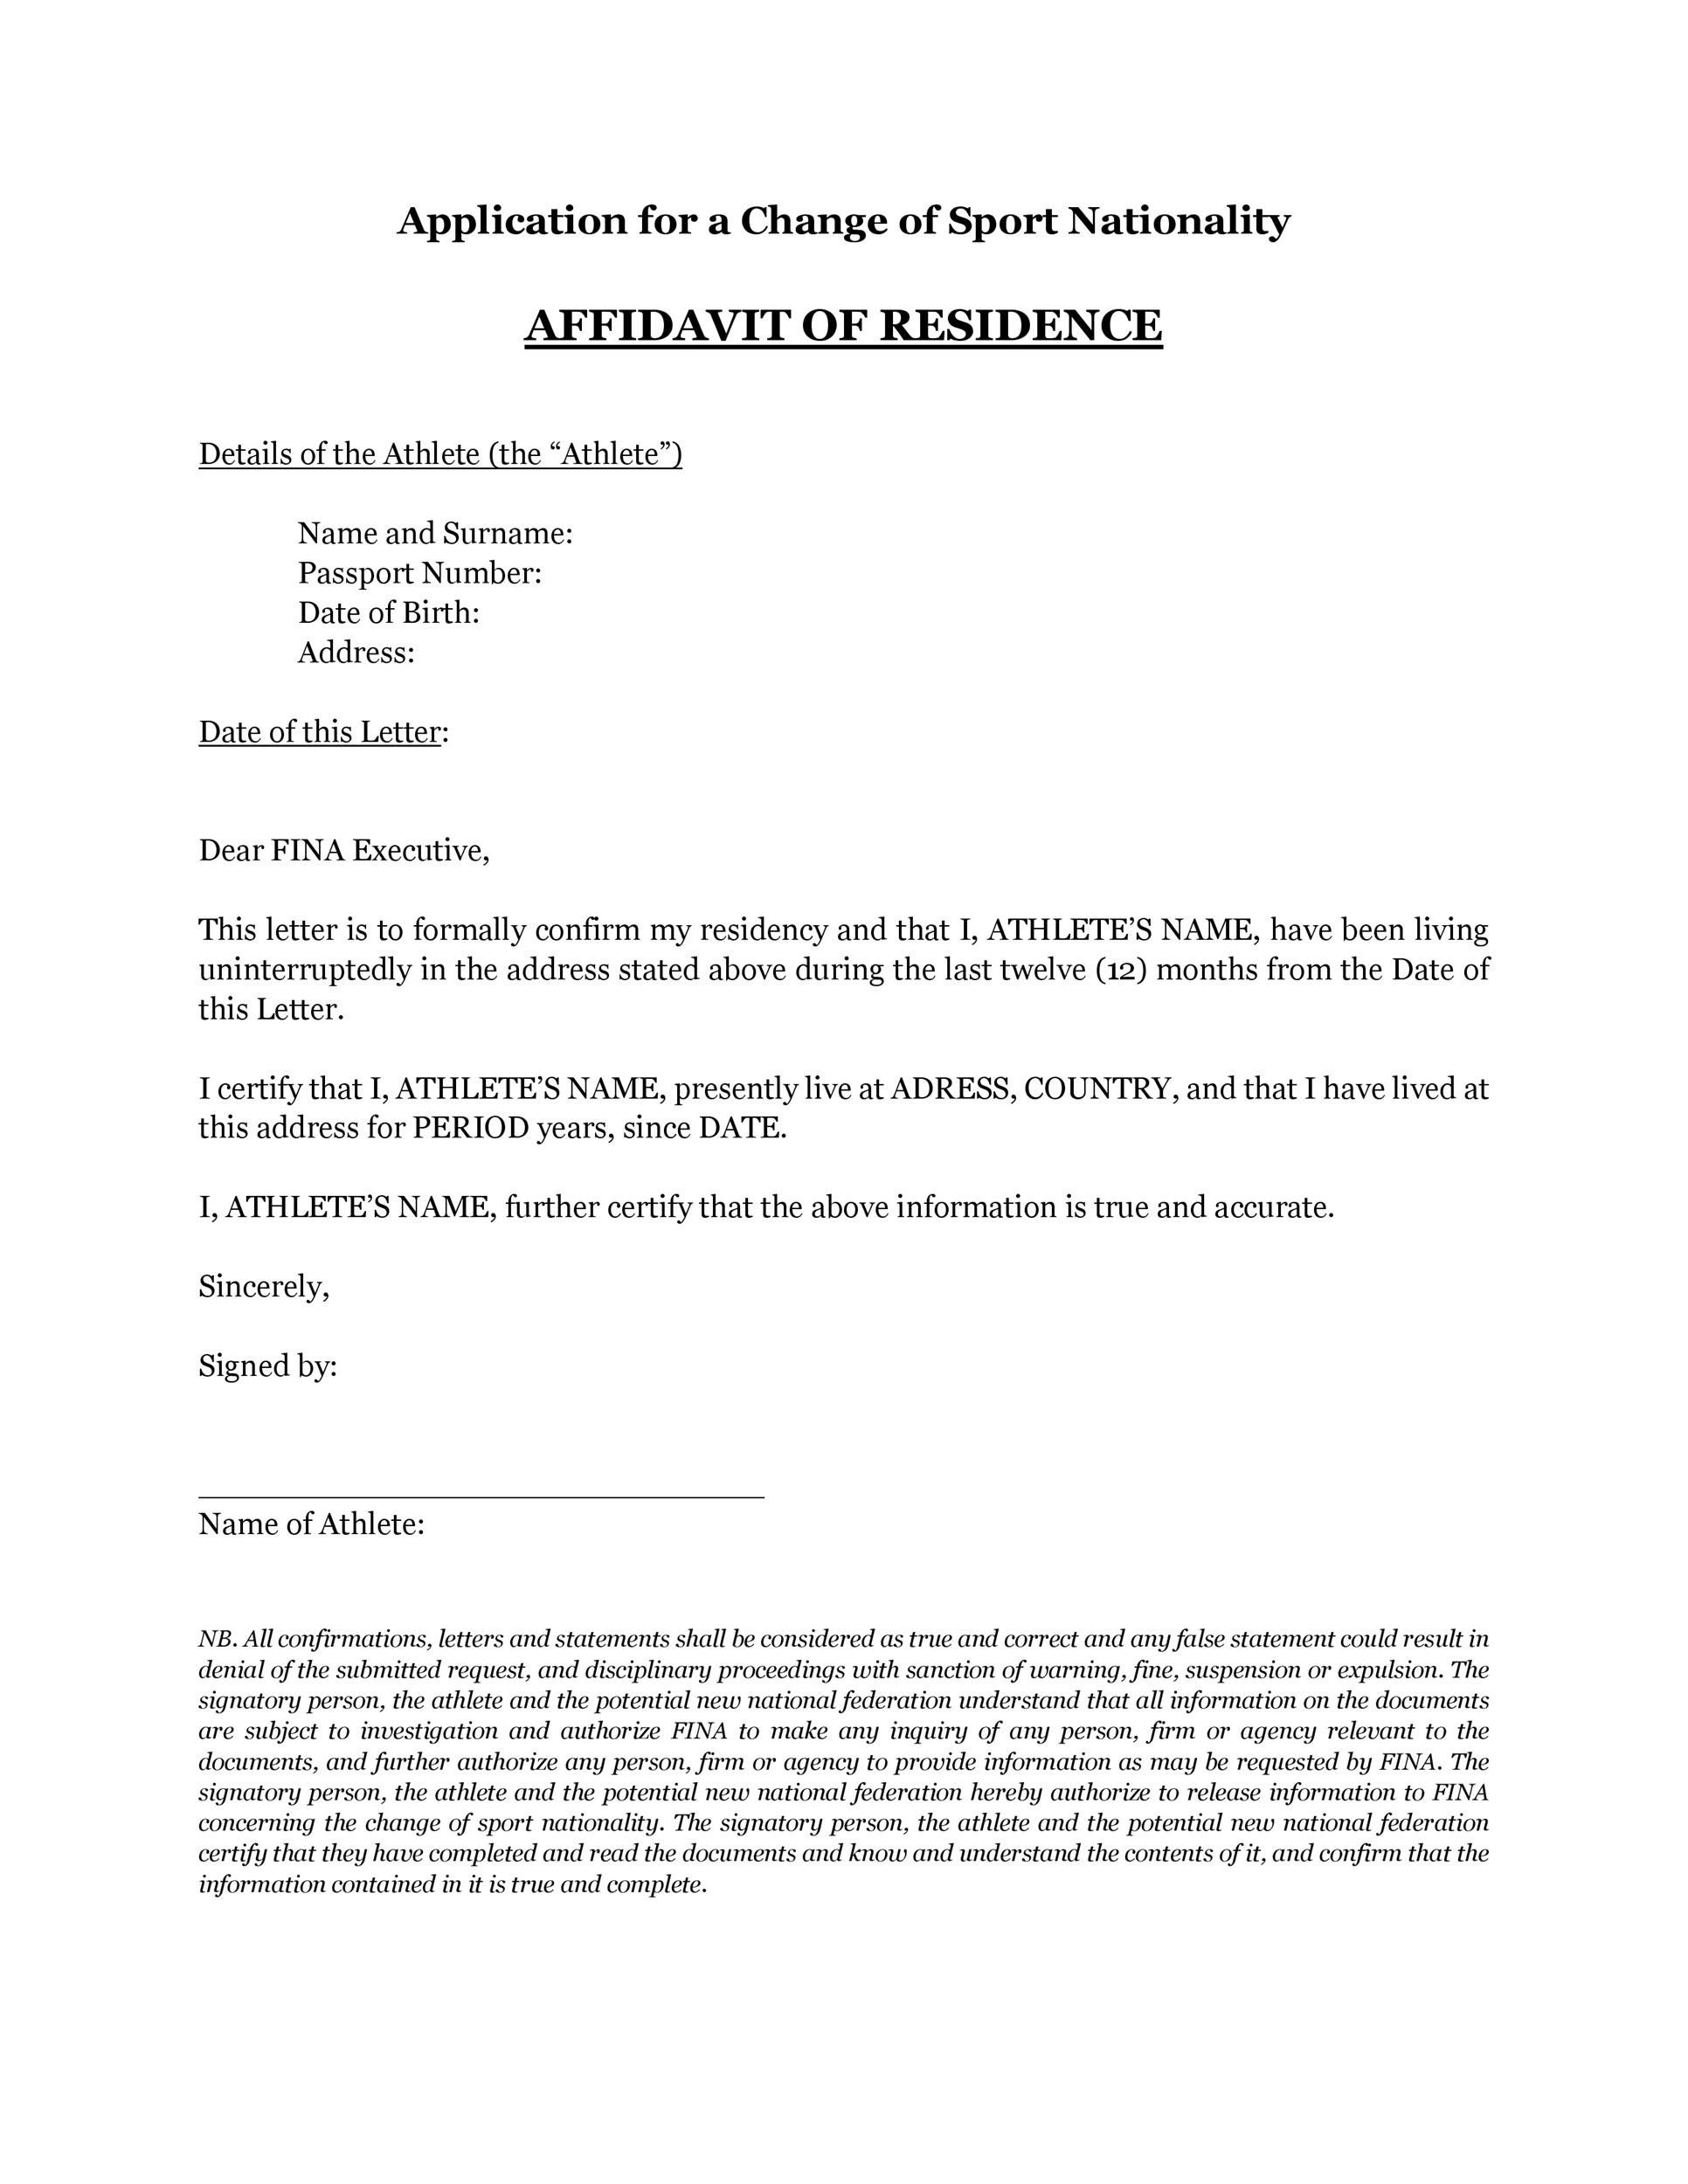 Proof Of Residency Letter Template Letter Templates Letter Template Word Lettering